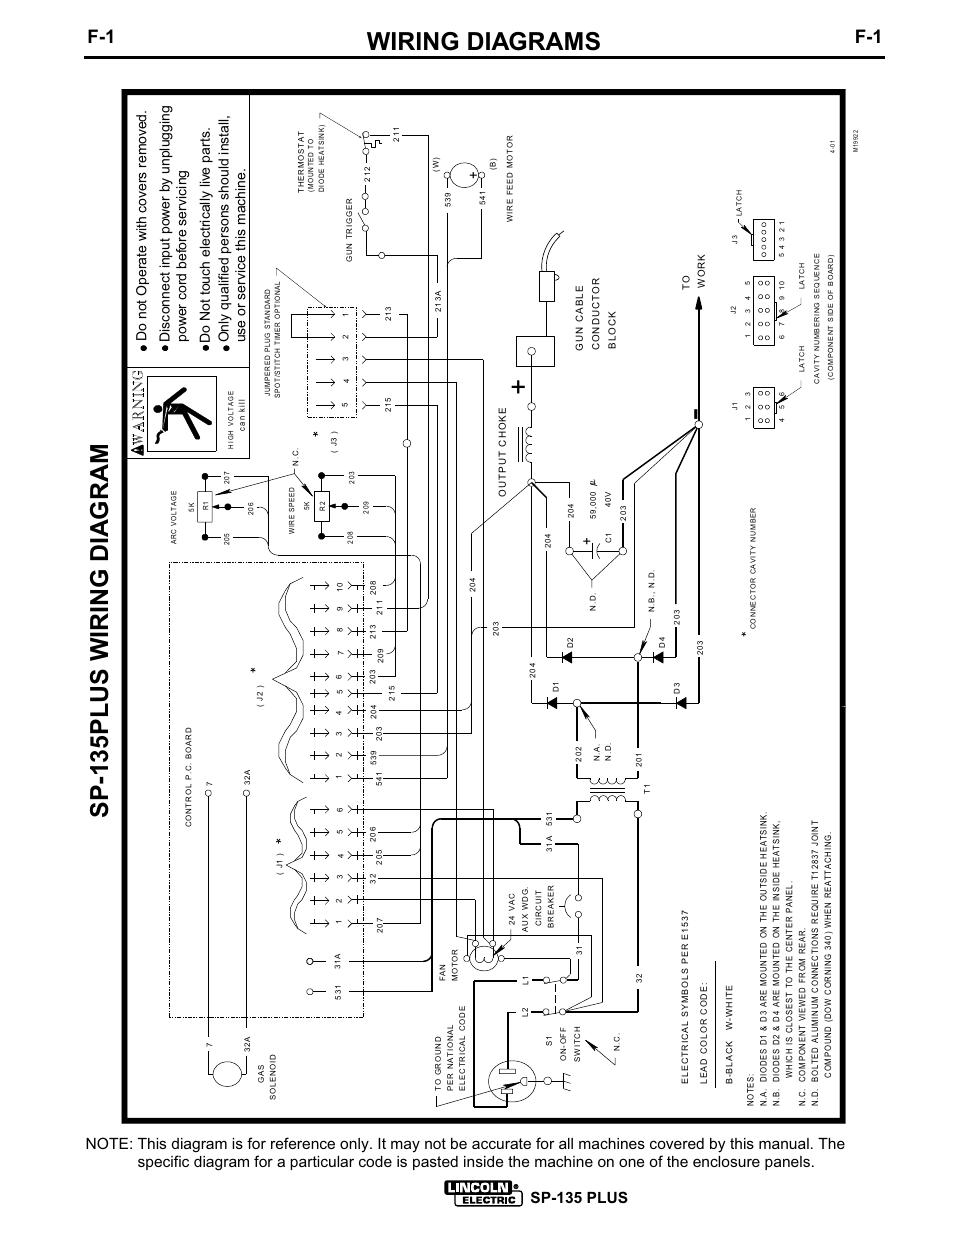 Wiring diagrams, Sp-135plus wiring dia gram, Sp-135 plus | Lincoln Electric  SP-135 PLUS IM725 User Manual | Page 43 / 48